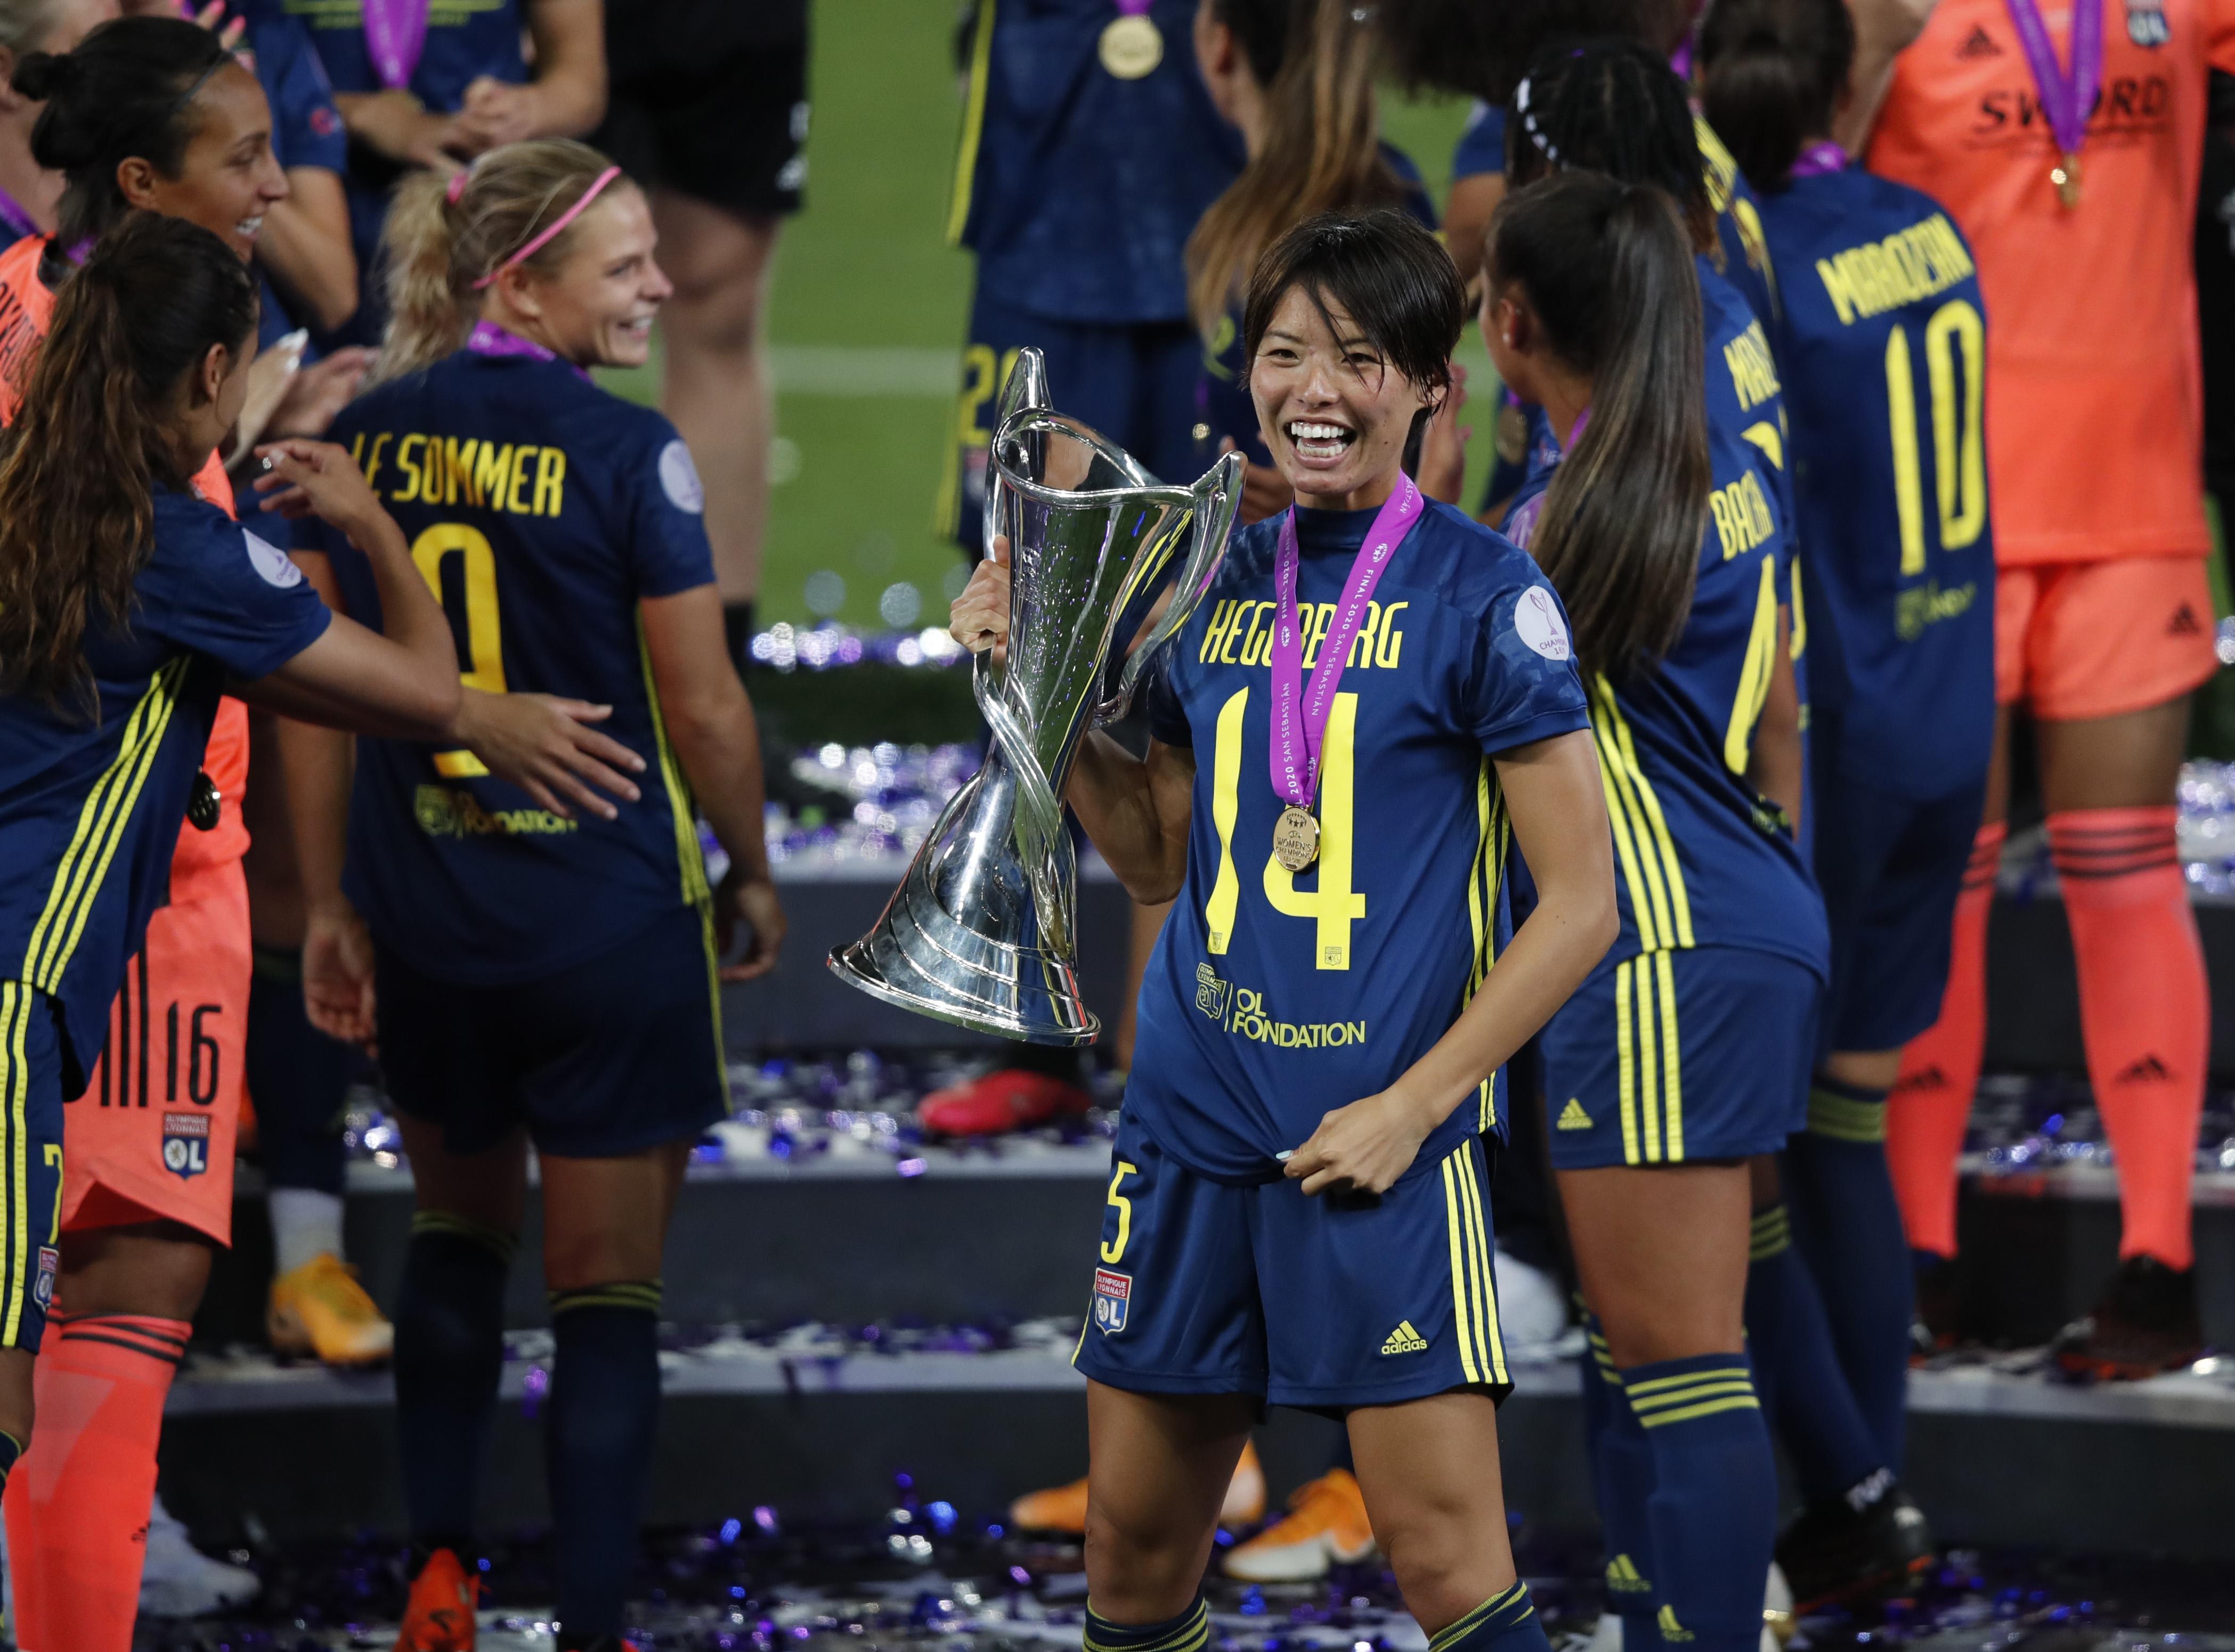 VfL Wolfsburg Women's v Olympique Lyonnais - UEFA Women's Champions League Final